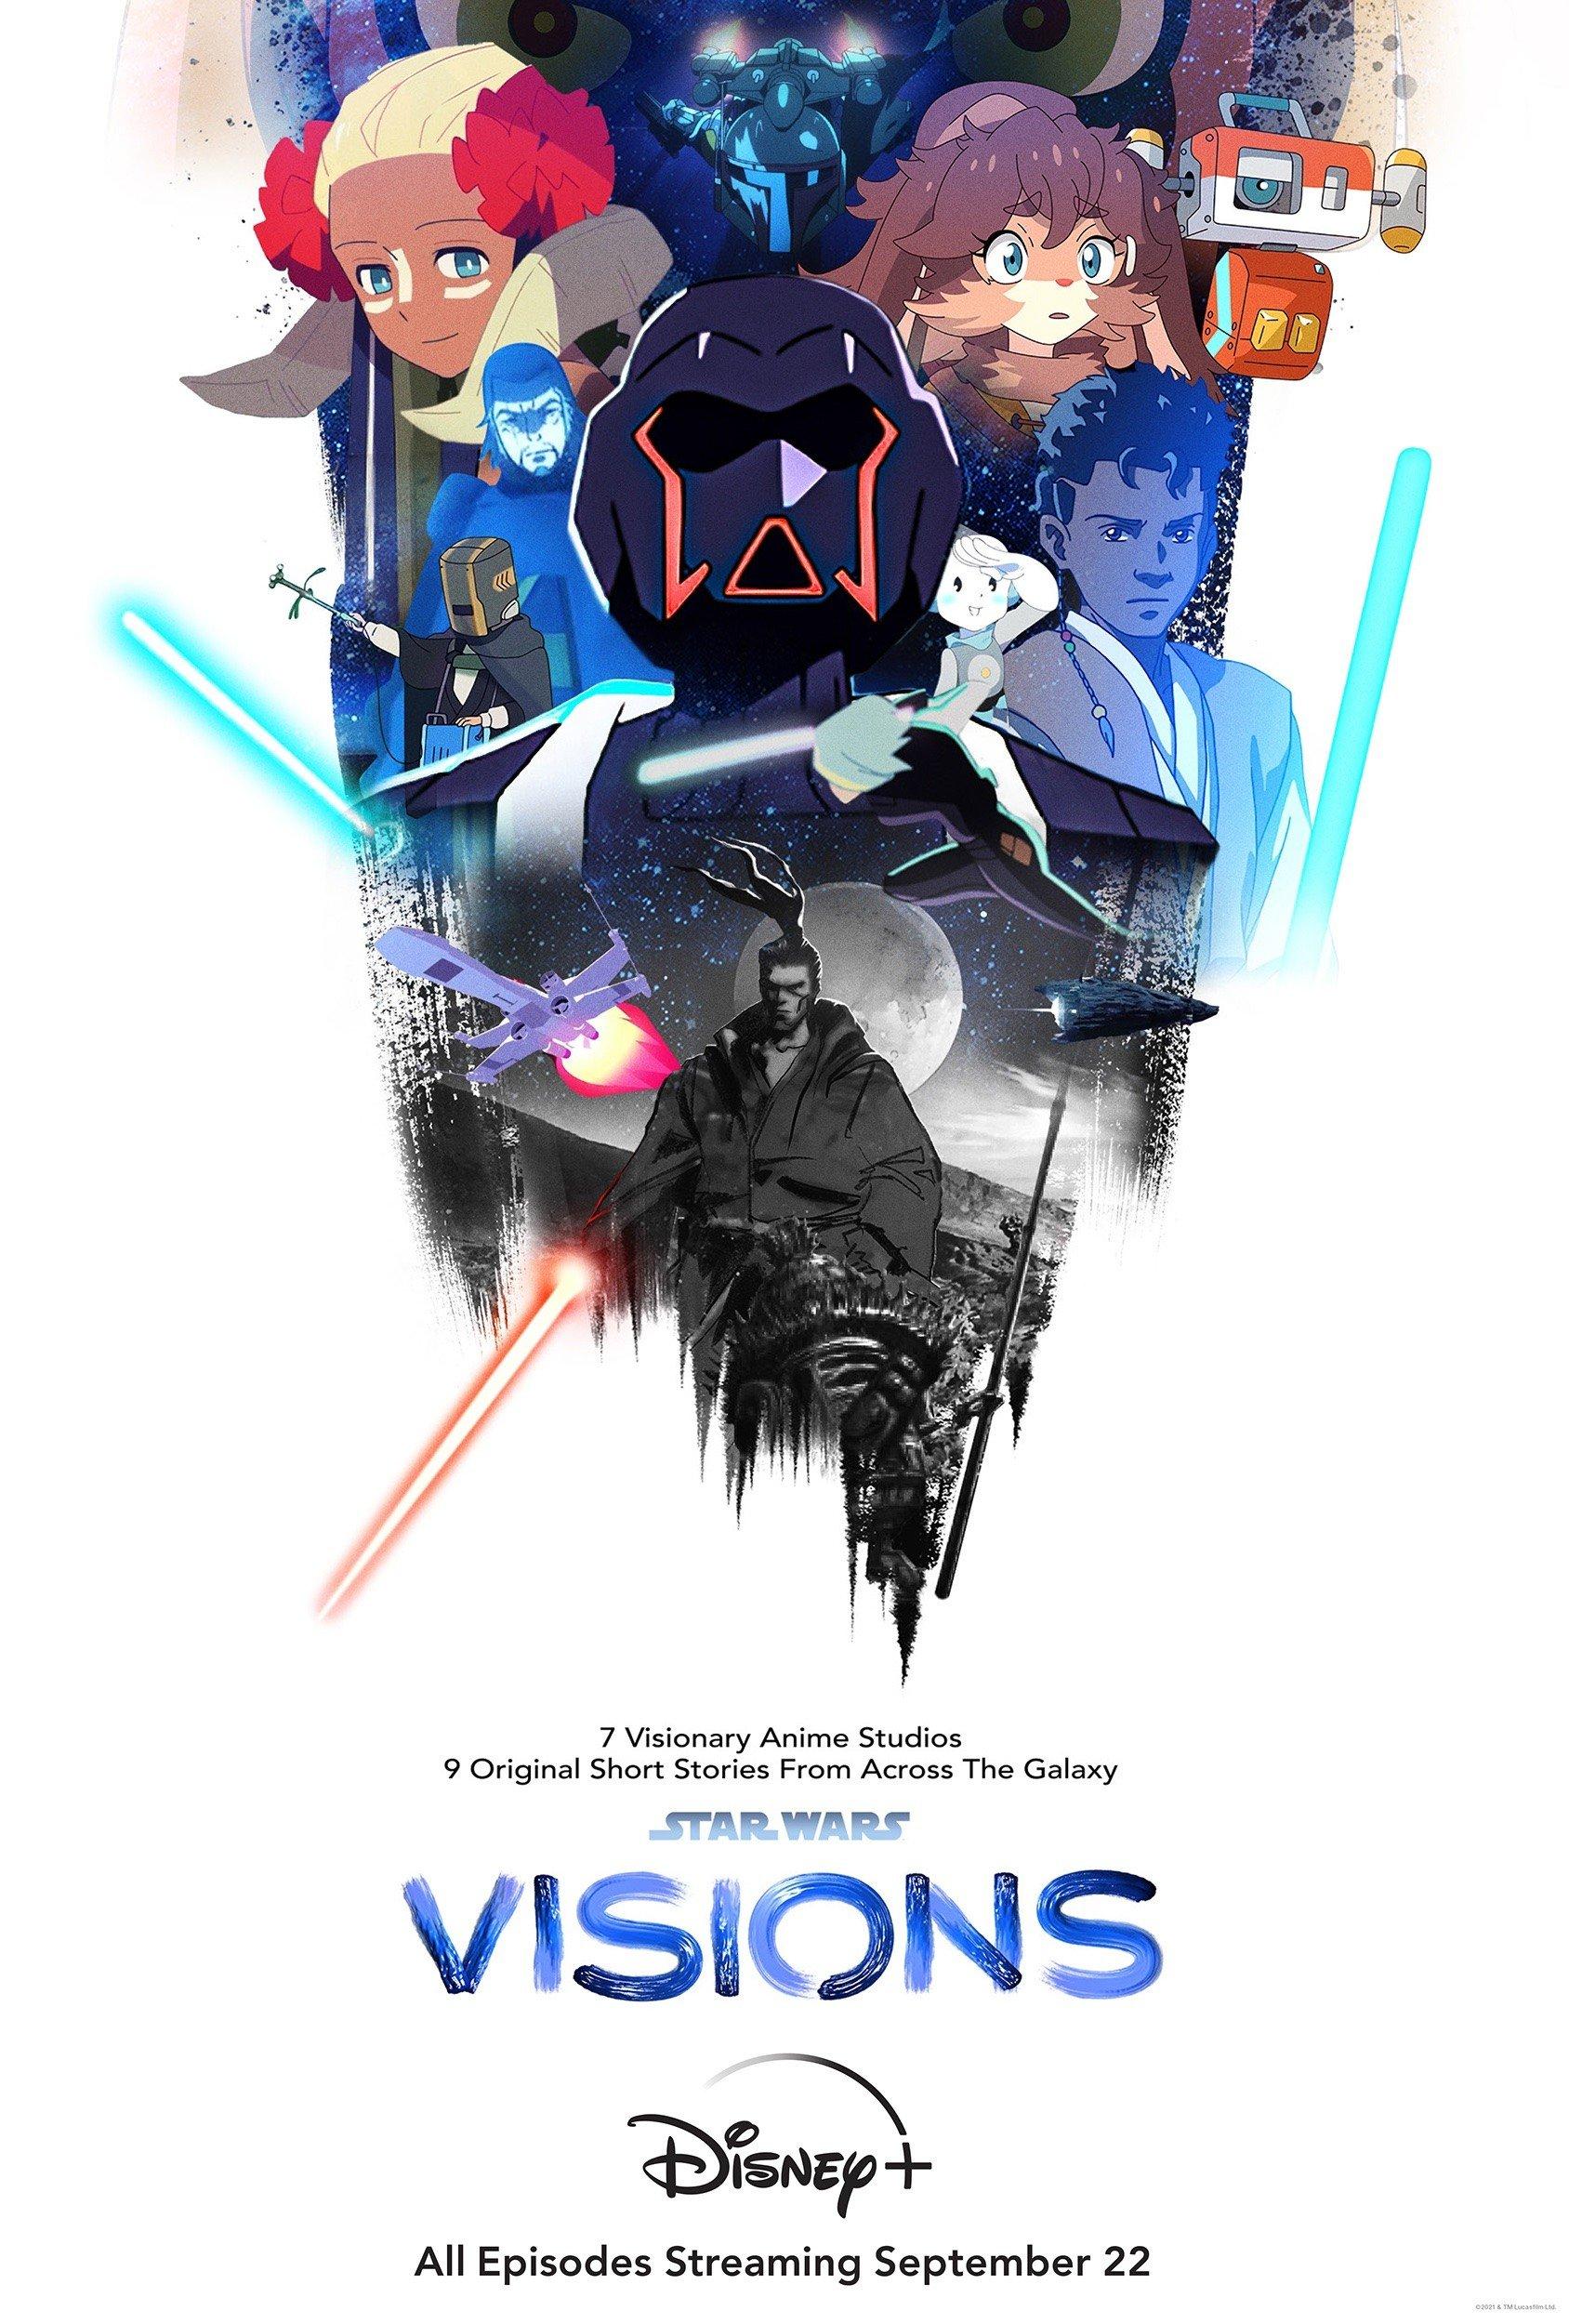 [LoliHouse] Star Wars: Visions [WebRip 1080p HEVC-10bit EAC3][简繁英日字幕]